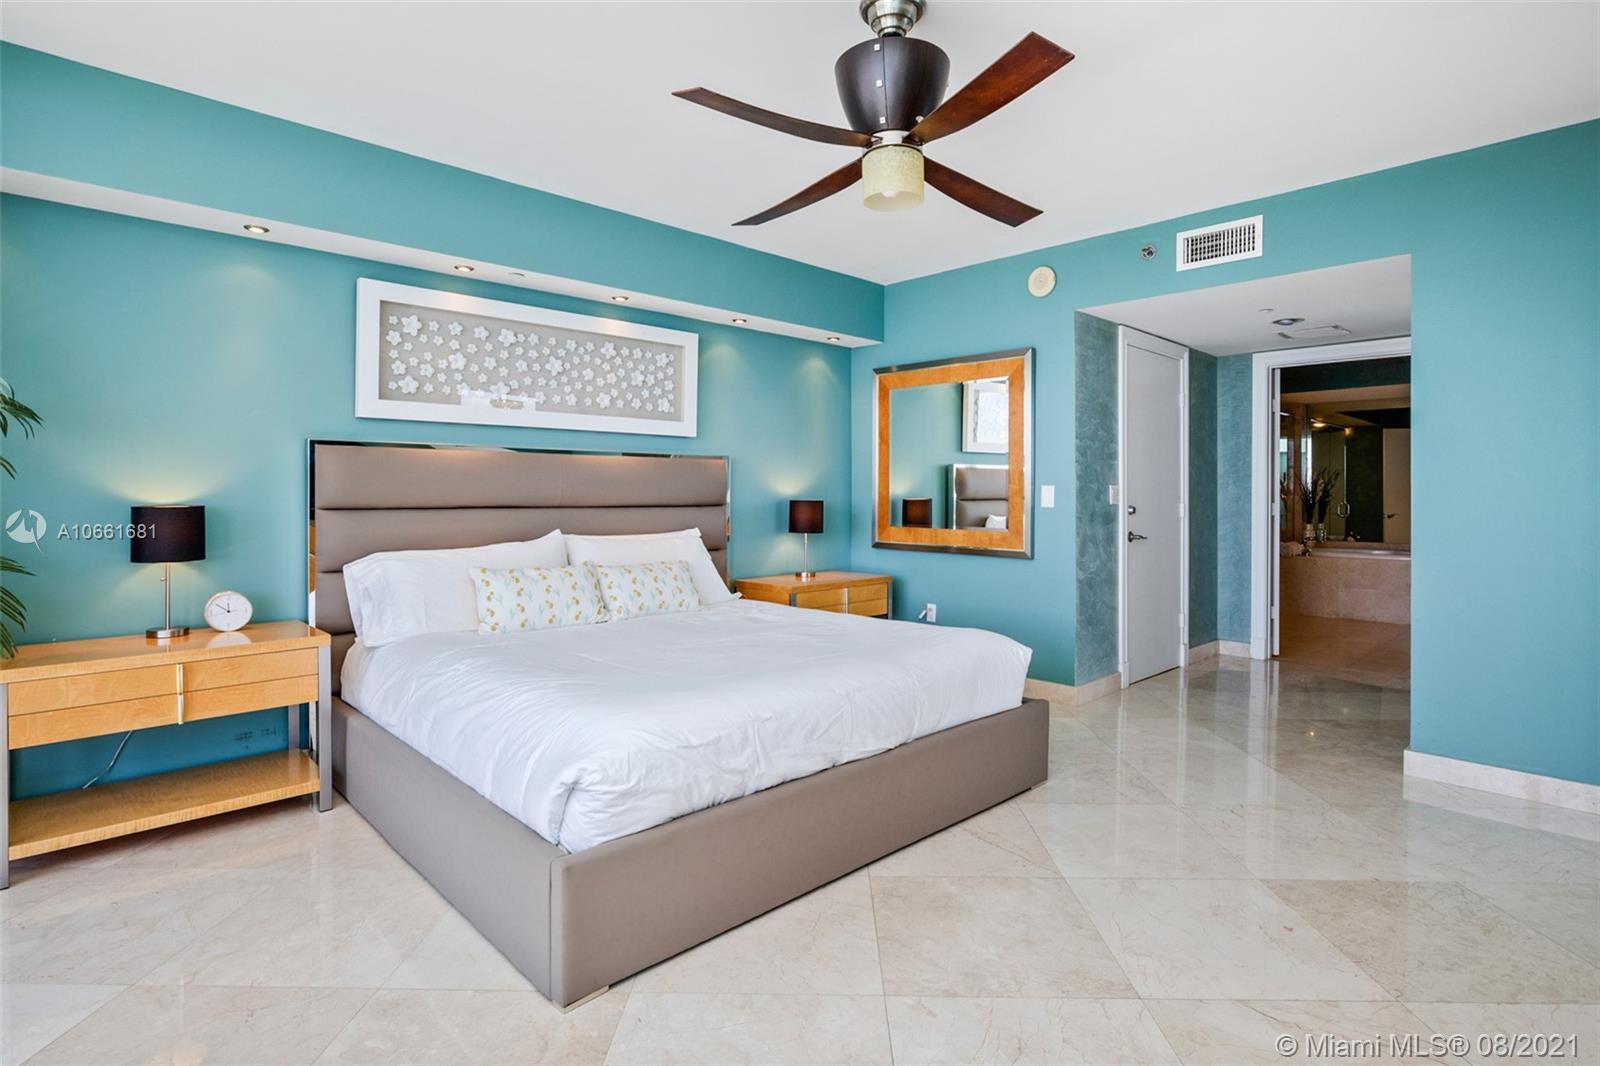 3602 3 / 3 2065 sq. ft. $ 2021-04-27 0 Photo